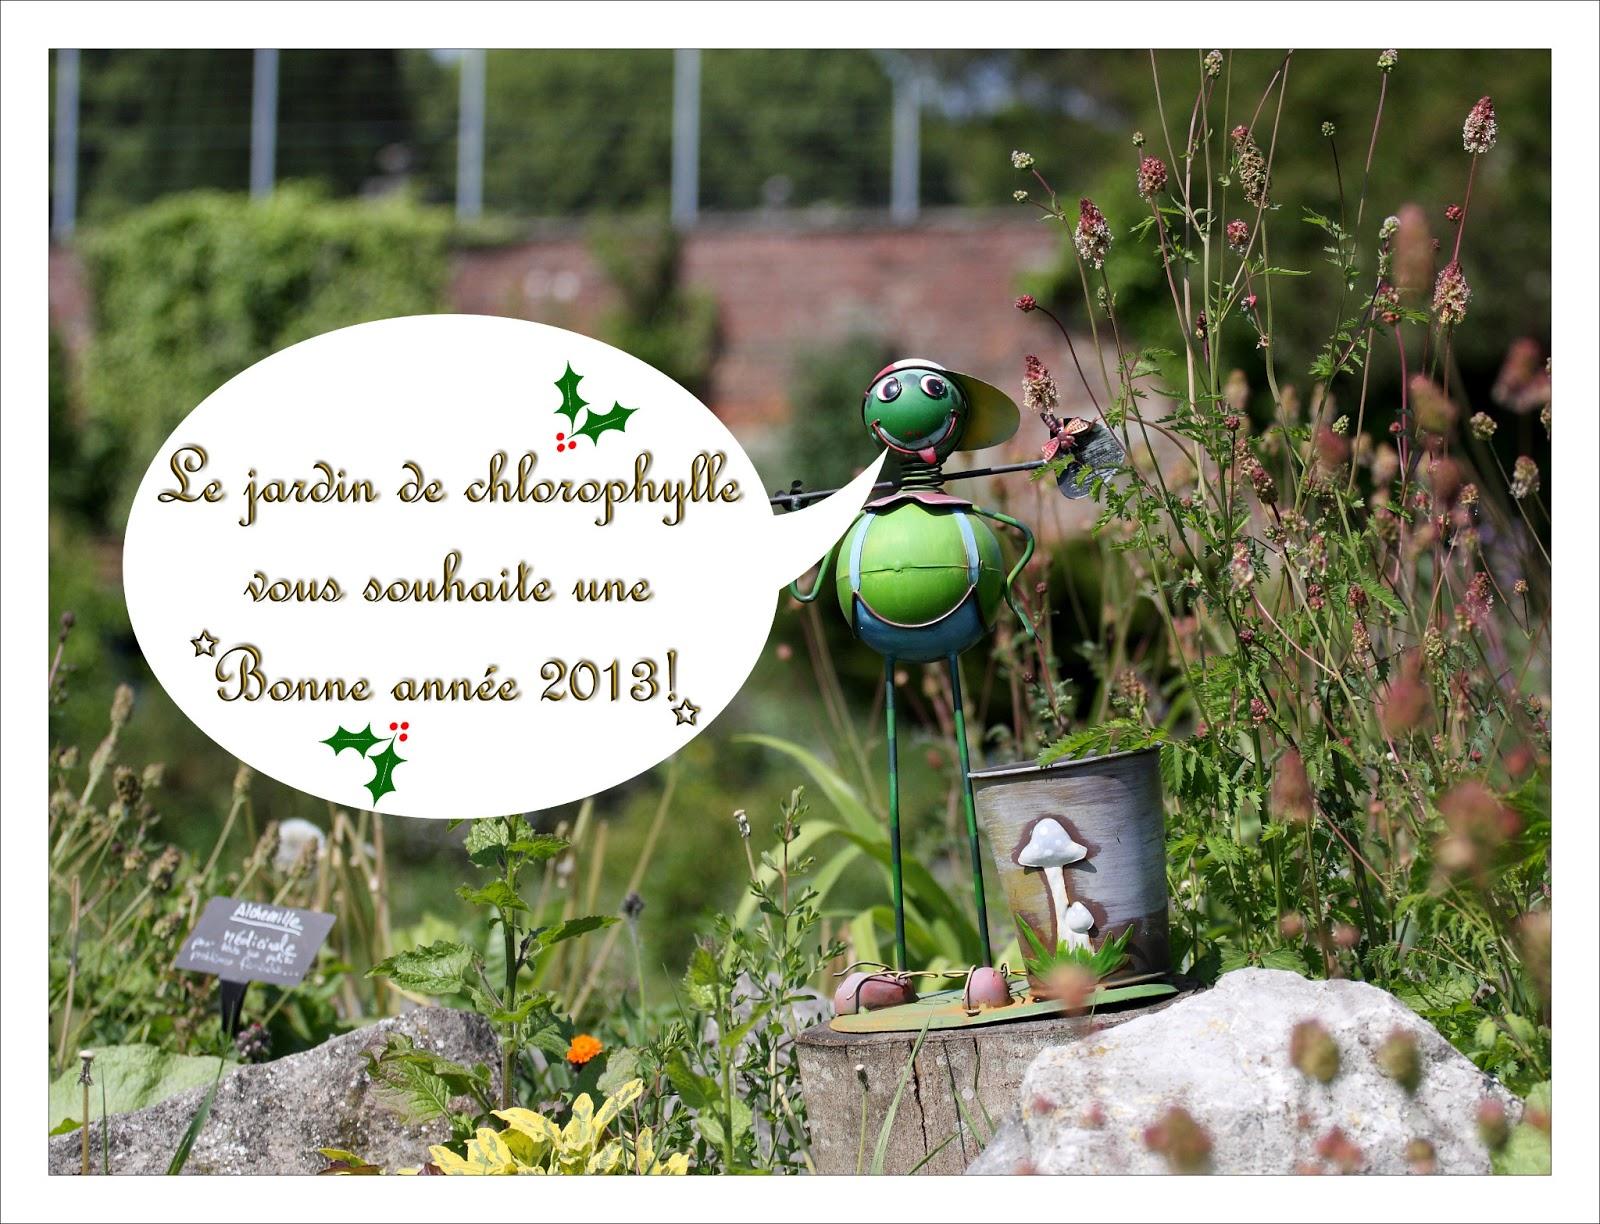 Le blog du jardin de chlorophylle janvier 2013 for Espace chlorophylle